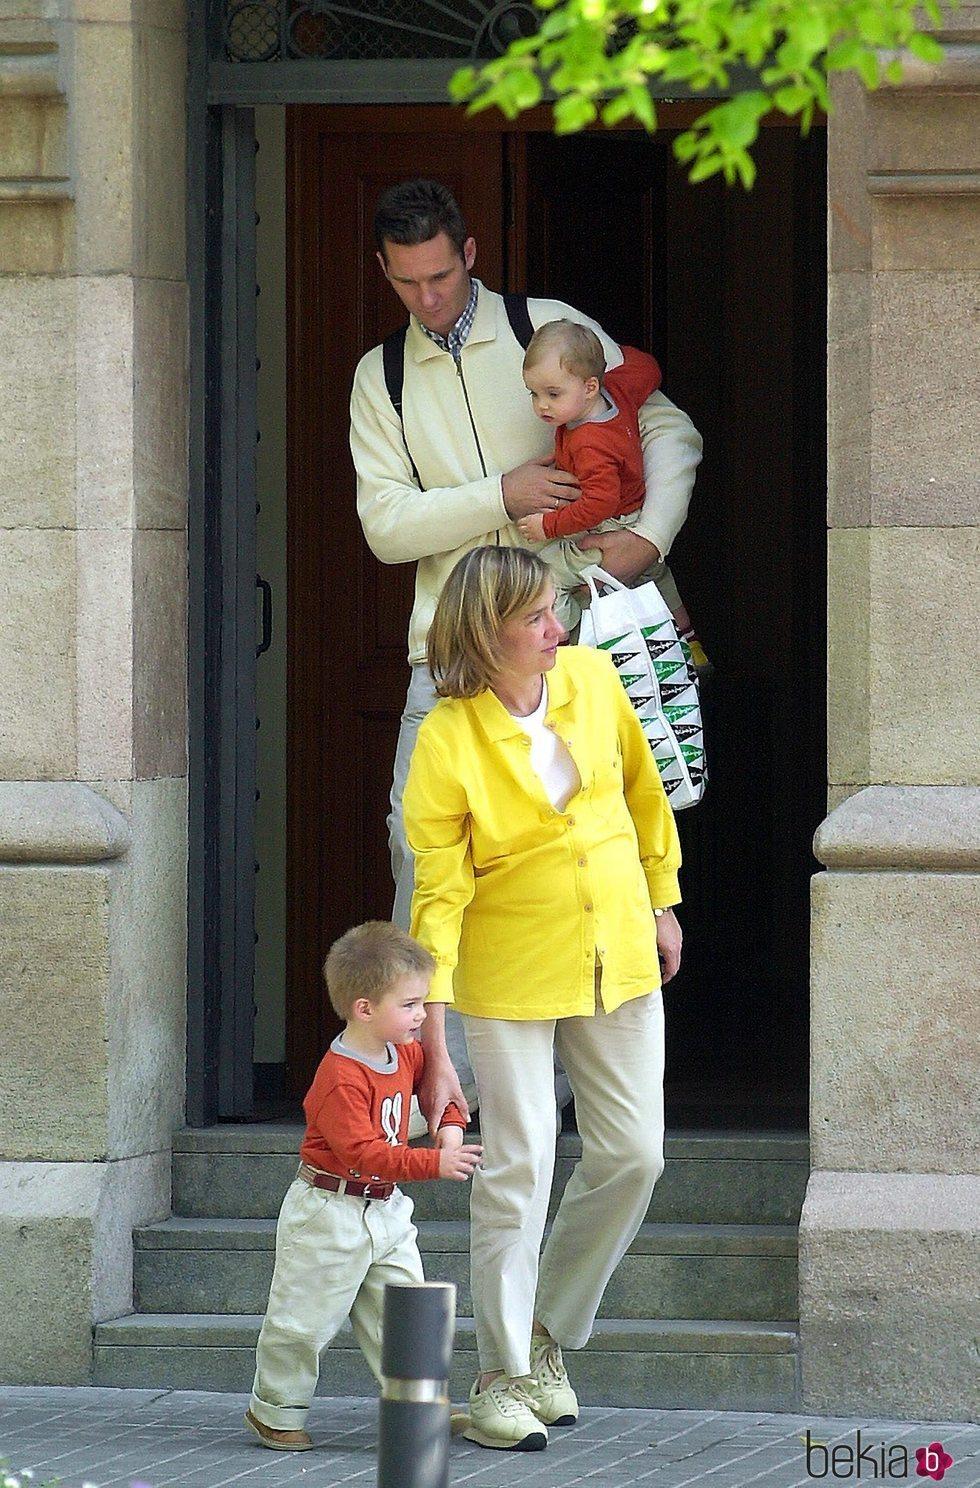 La Infanta Cristina e Iñaki Urdangarin con sus hijos Juan y Pablo Urdangarin saliendo de una iglesia